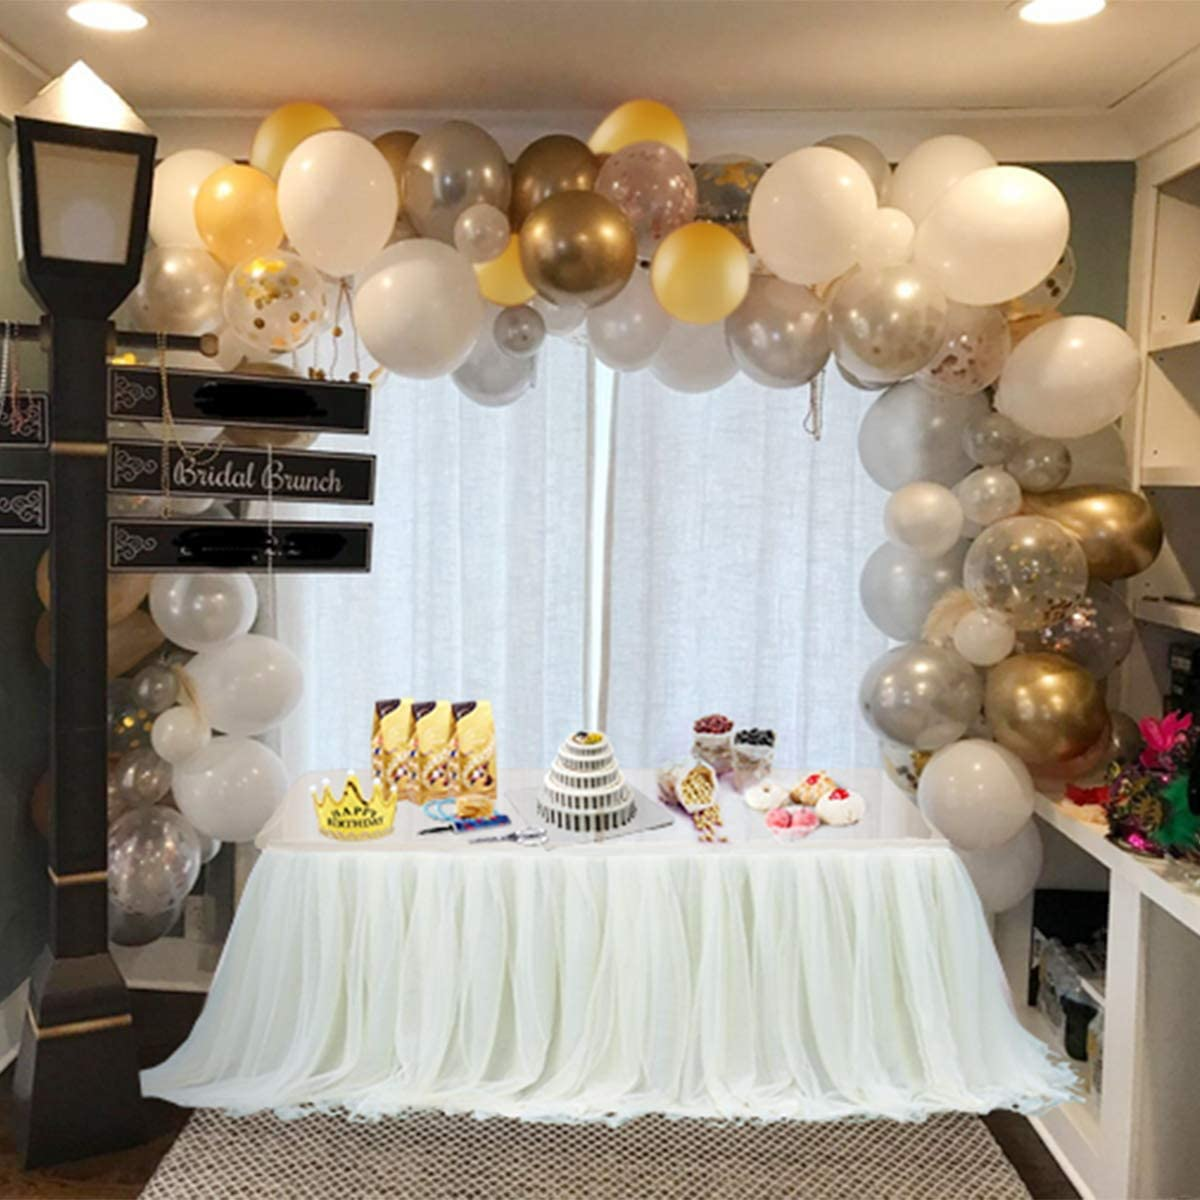 Amazon Com Balloon Arch Garland Kit 100 Pearl White Chrome